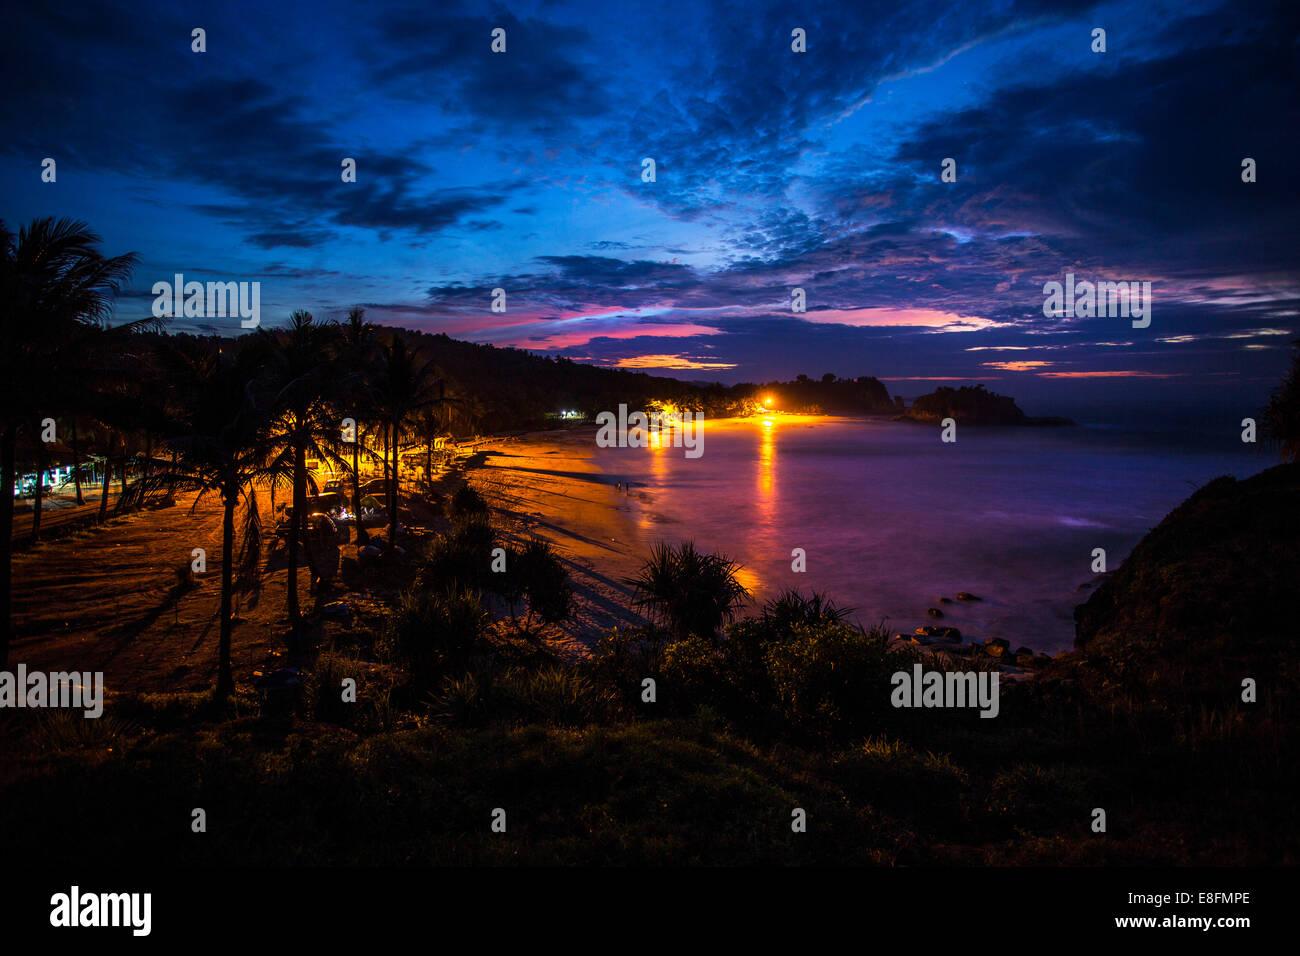 L'Est de Java, Klayar Beach at Dusk Photo Stock